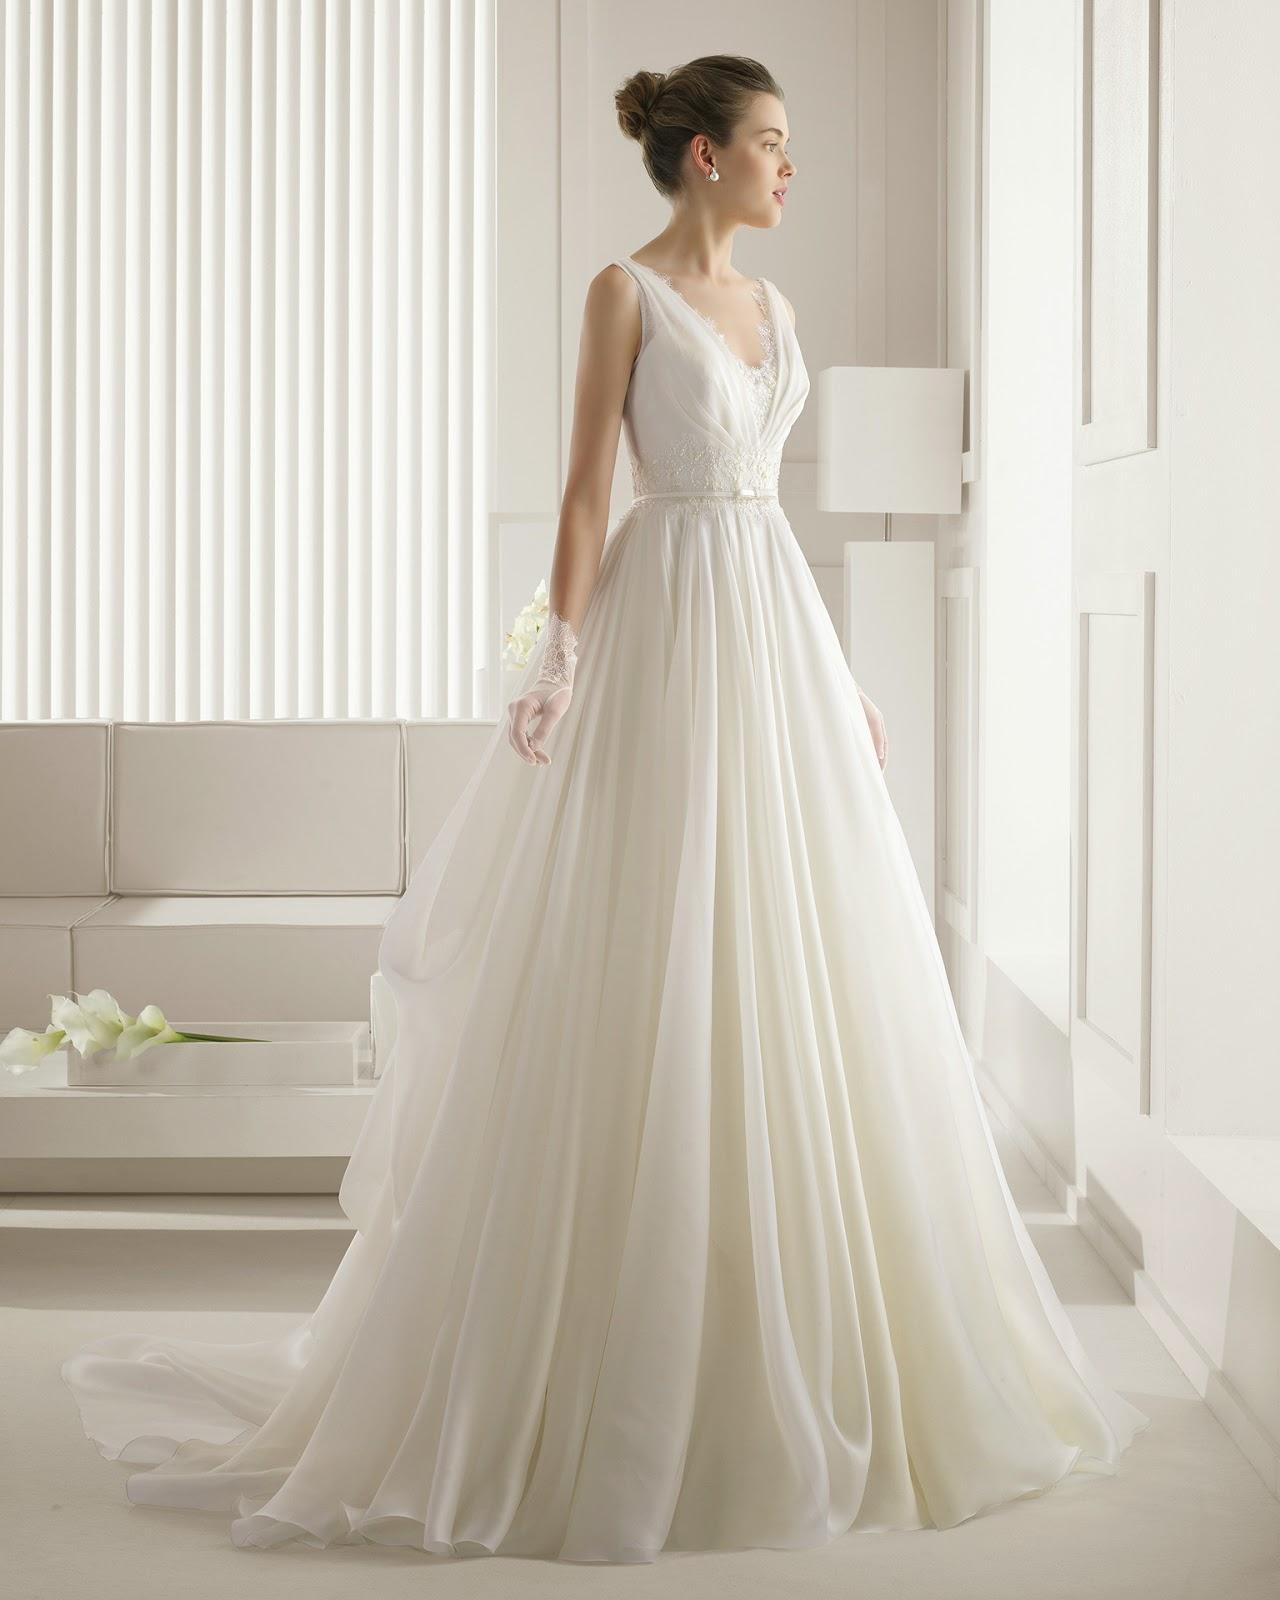 8241886a5 ▷ 10 vestidos de novia románticos para tu boda - ▷ Blog de bodas ...